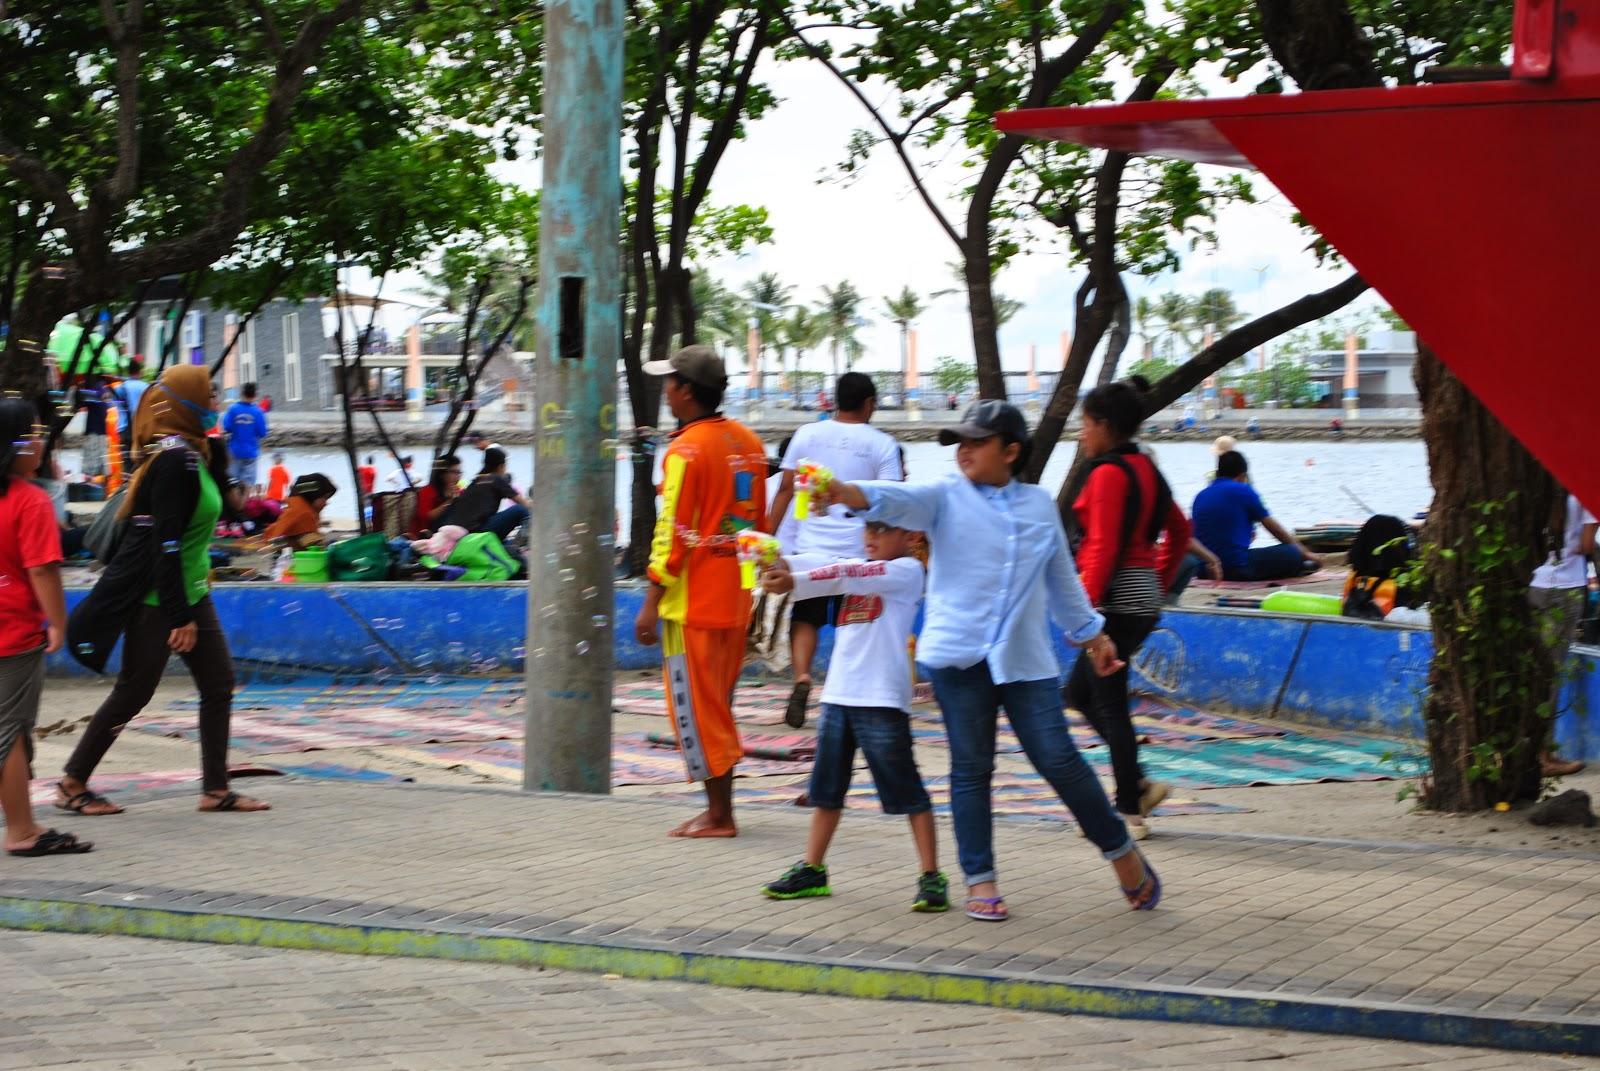 bokep anak kecil @@@ Tidah hanya anak-anak kecil yang bermain air di tepih pantai Ancol ini,  banyak muda-mudi yang juga bersenang riang gembira bermain ataupun sekedar  ...